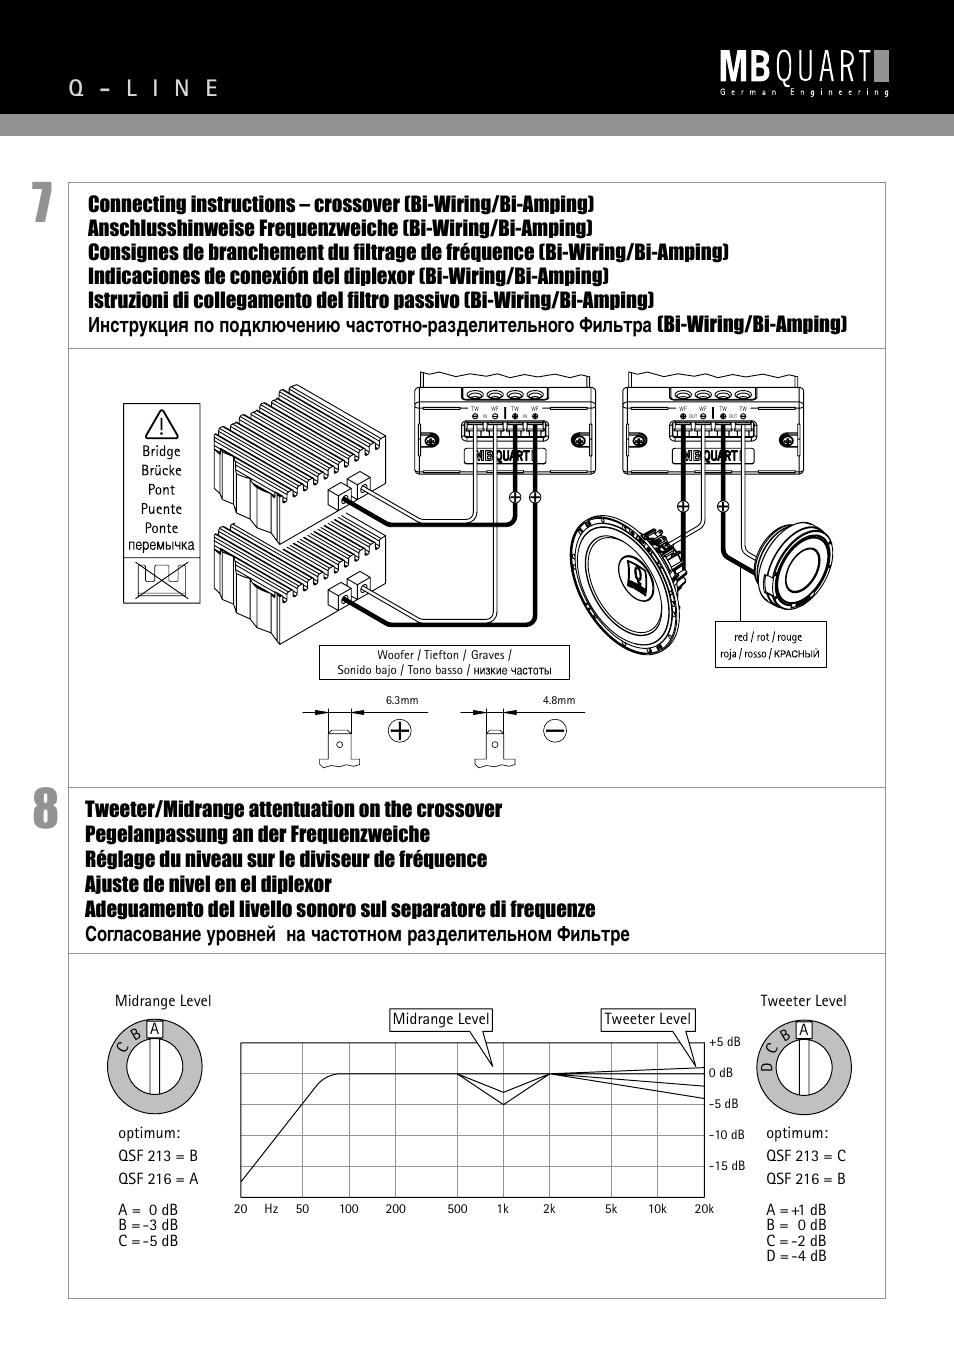 dbx crossover wiring diagram